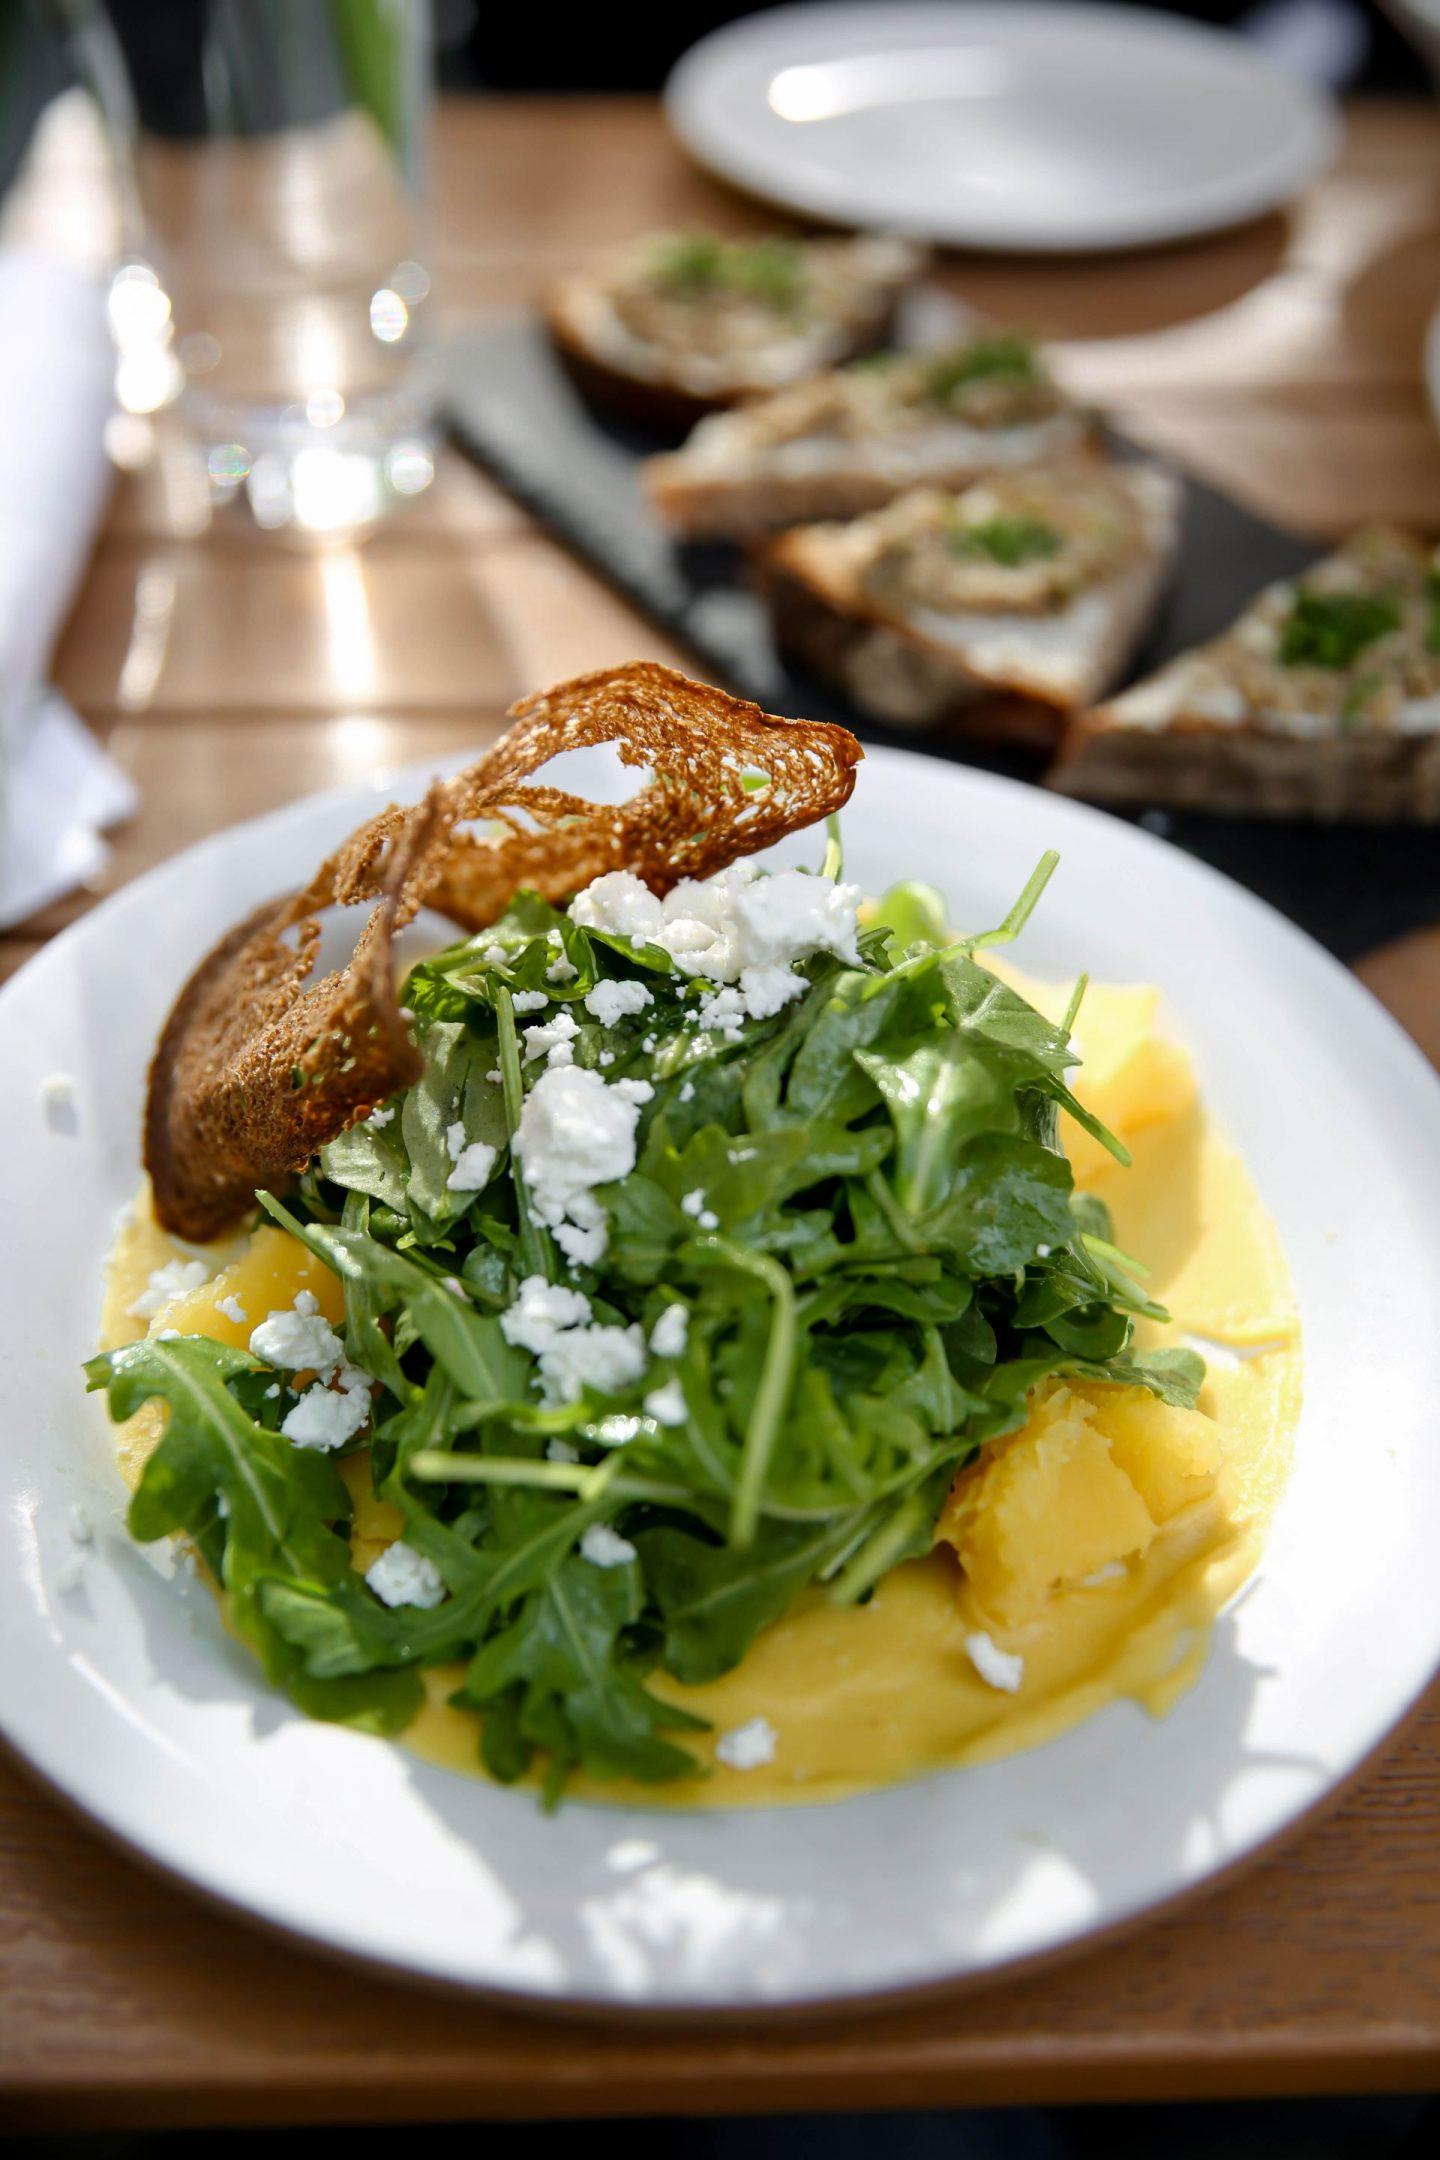 Kitchen Step - Seasonal Arugala Salad - Lauren Schwaiger Travel Guide